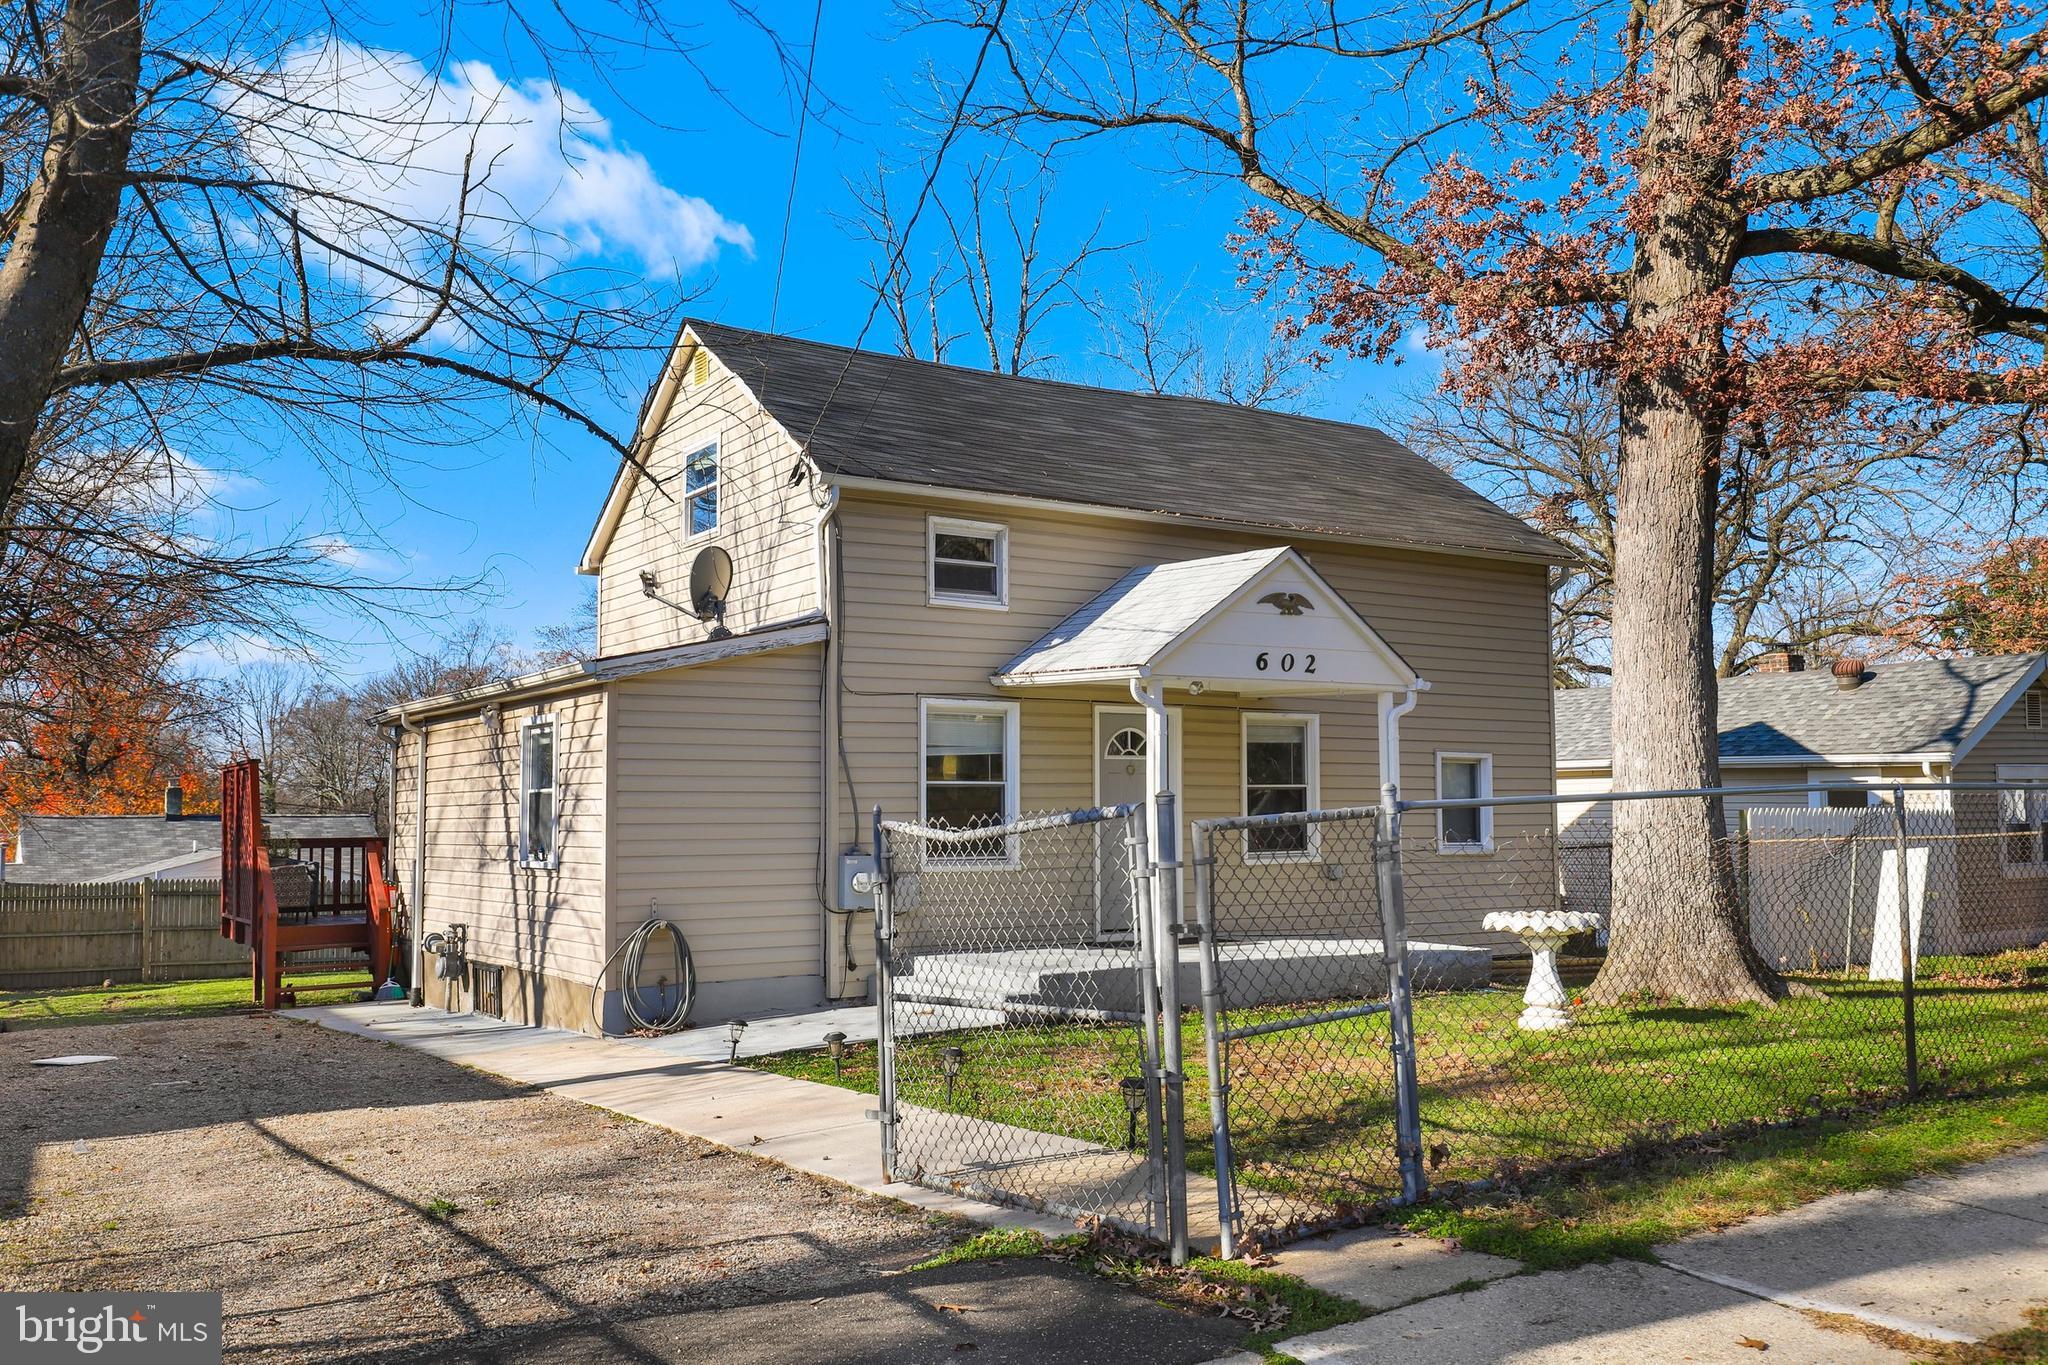 602 Goldleaf Ave, Capitol Heights, MD, 20743